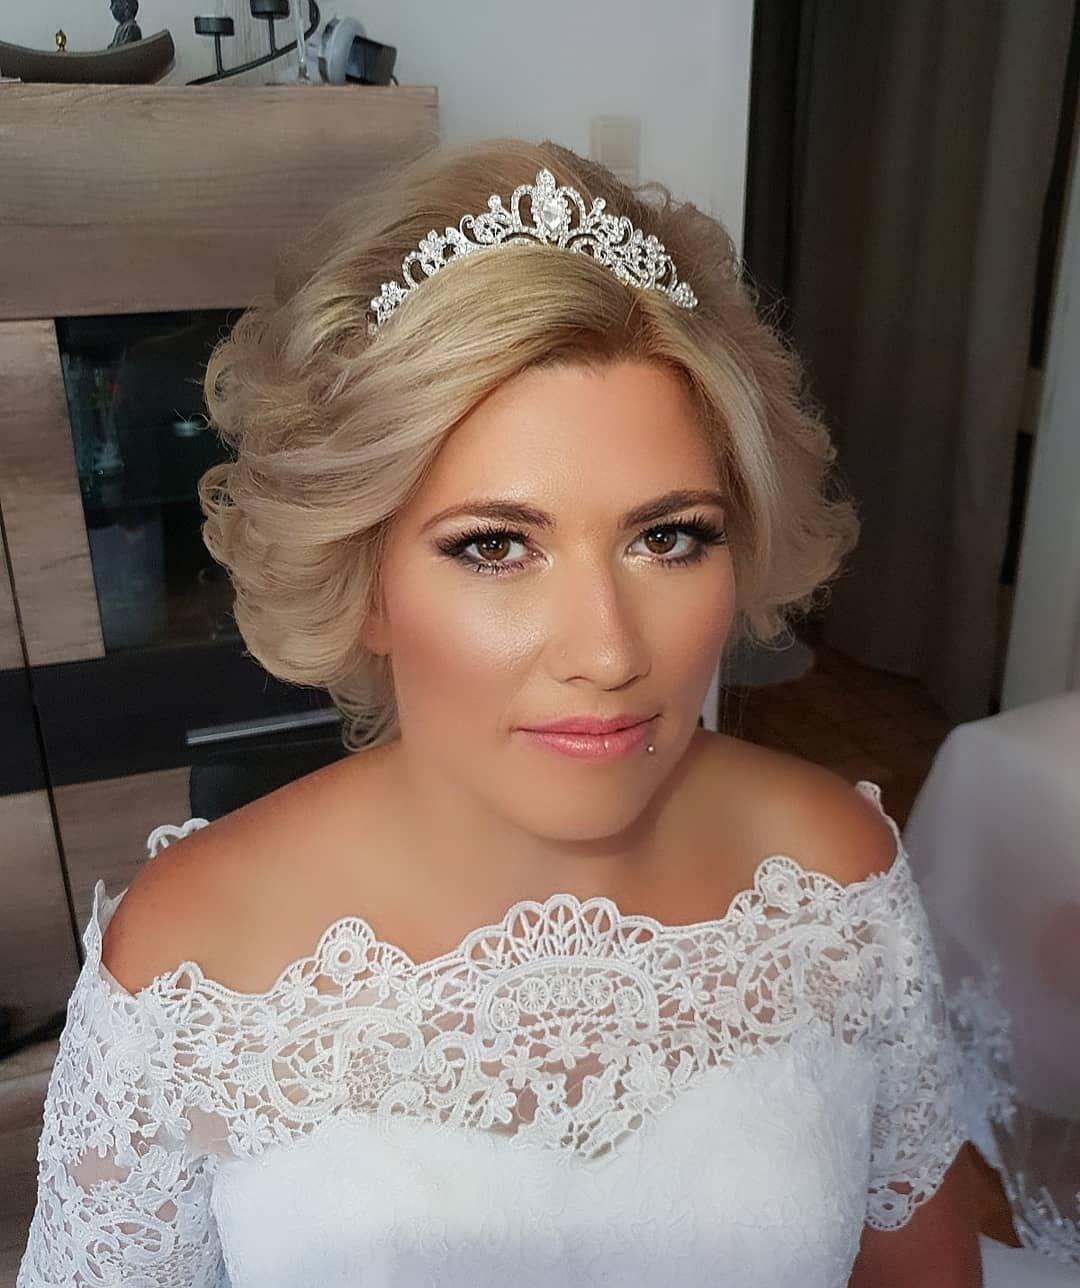 Wedding Styling By Ludmilajost Brautmakeup Brautkleid Hochzeitsfrisur Weddingdress Wedding Crailshei Wedding Dresses Lace Wedding Dresses Wedding Styles